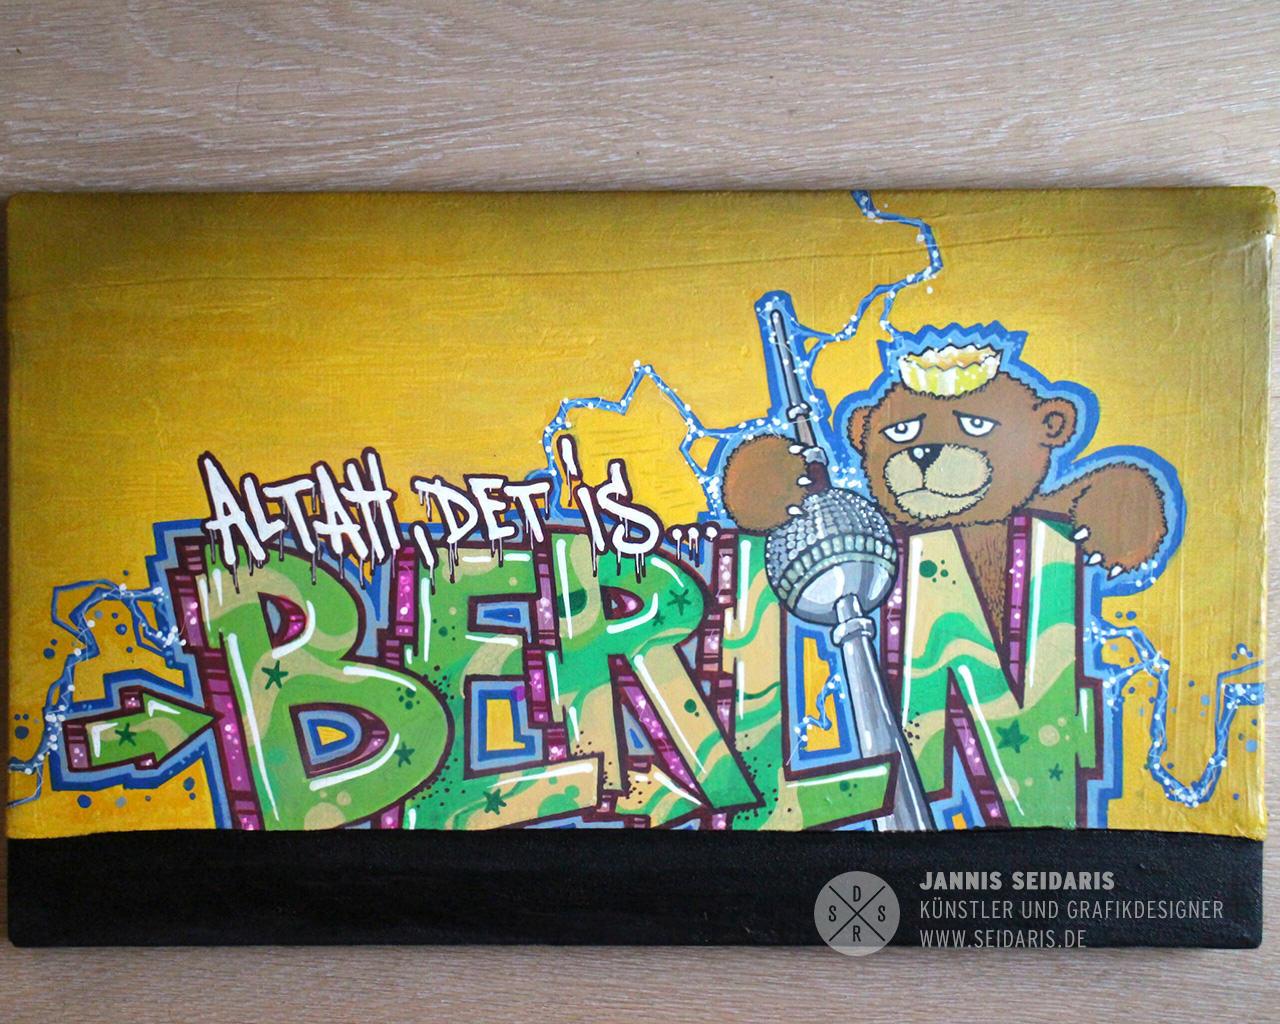 graffiti graffity archives jannis seidaris design kunst. Black Bedroom Furniture Sets. Home Design Ideas